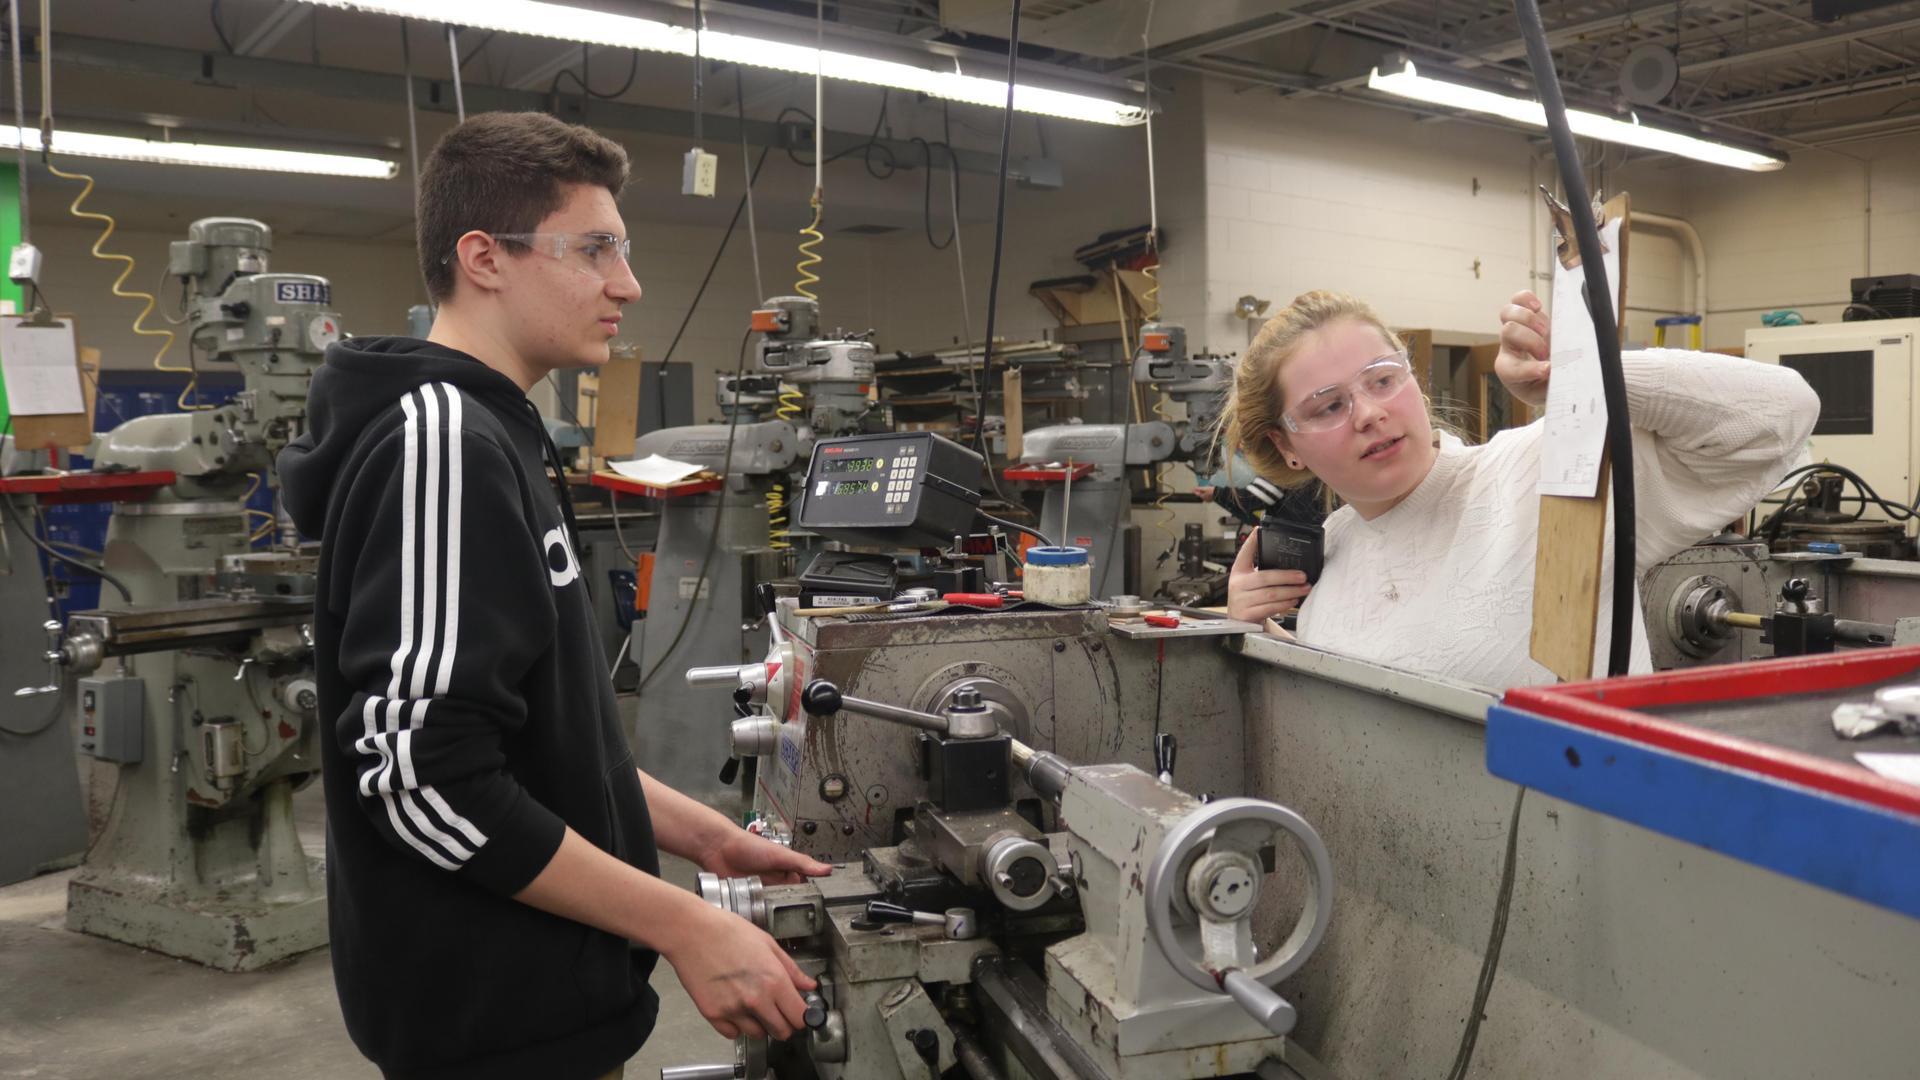 Students working on machine